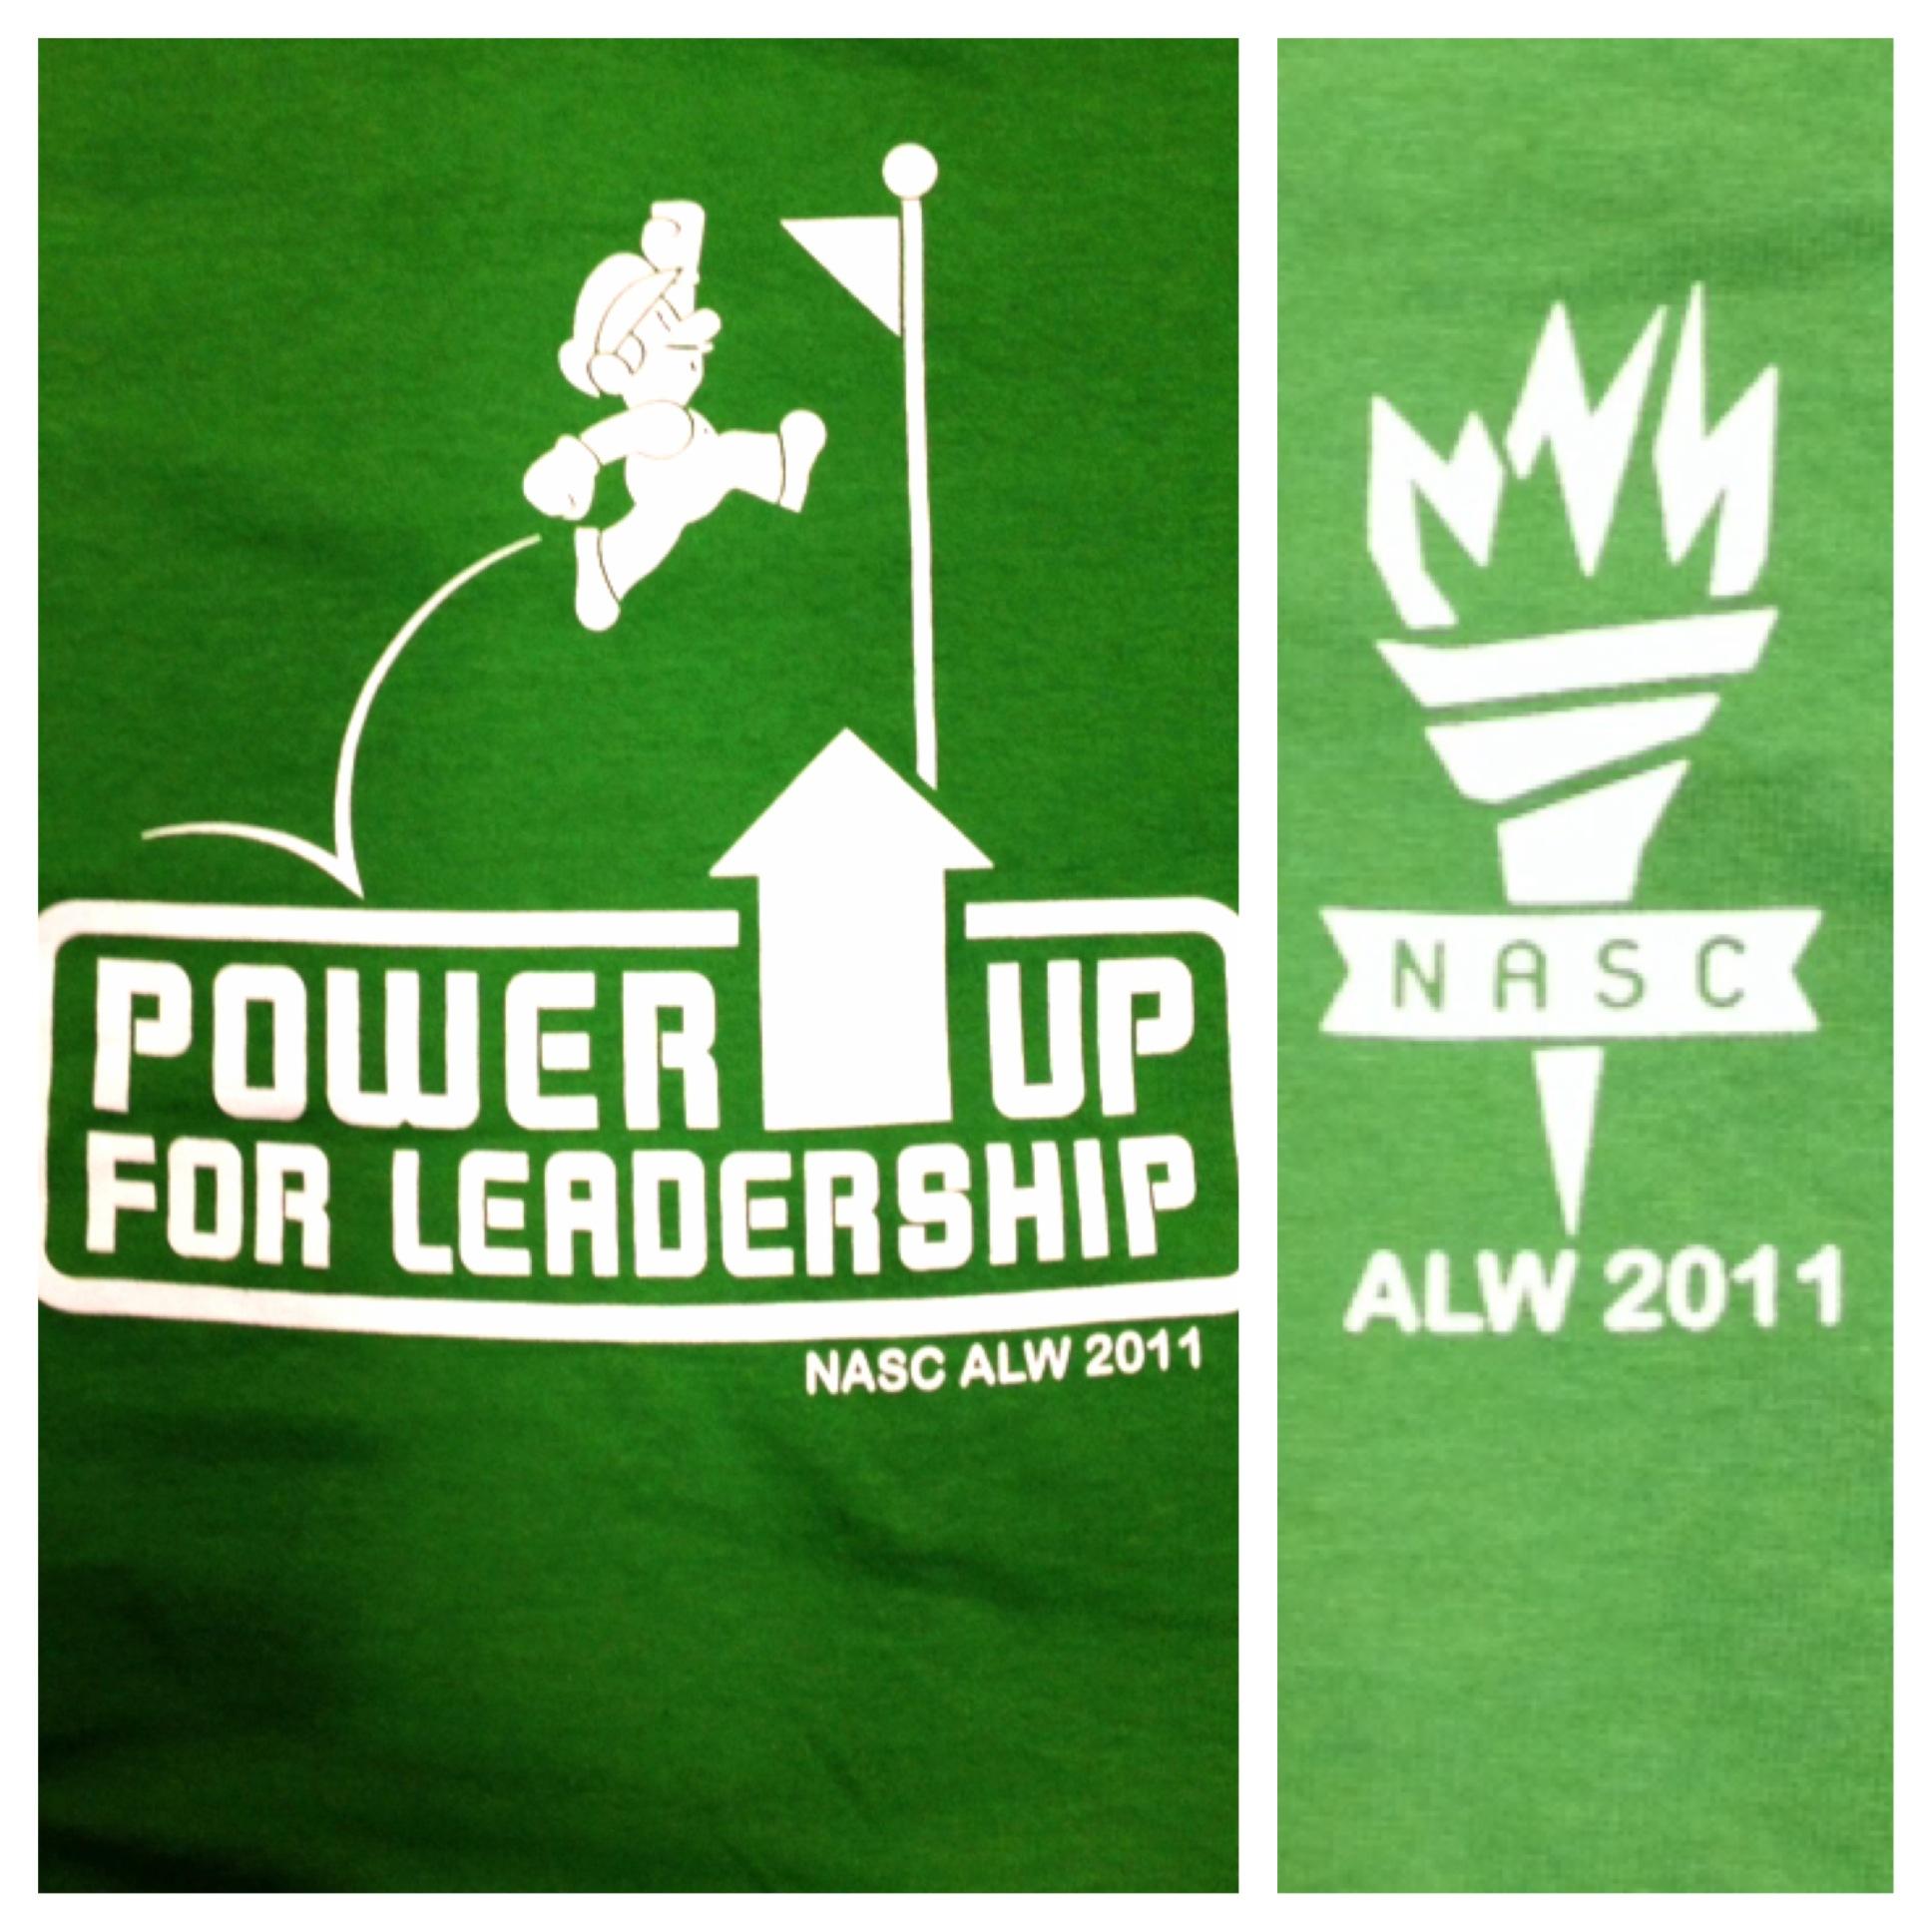 2011 ALW Shirt